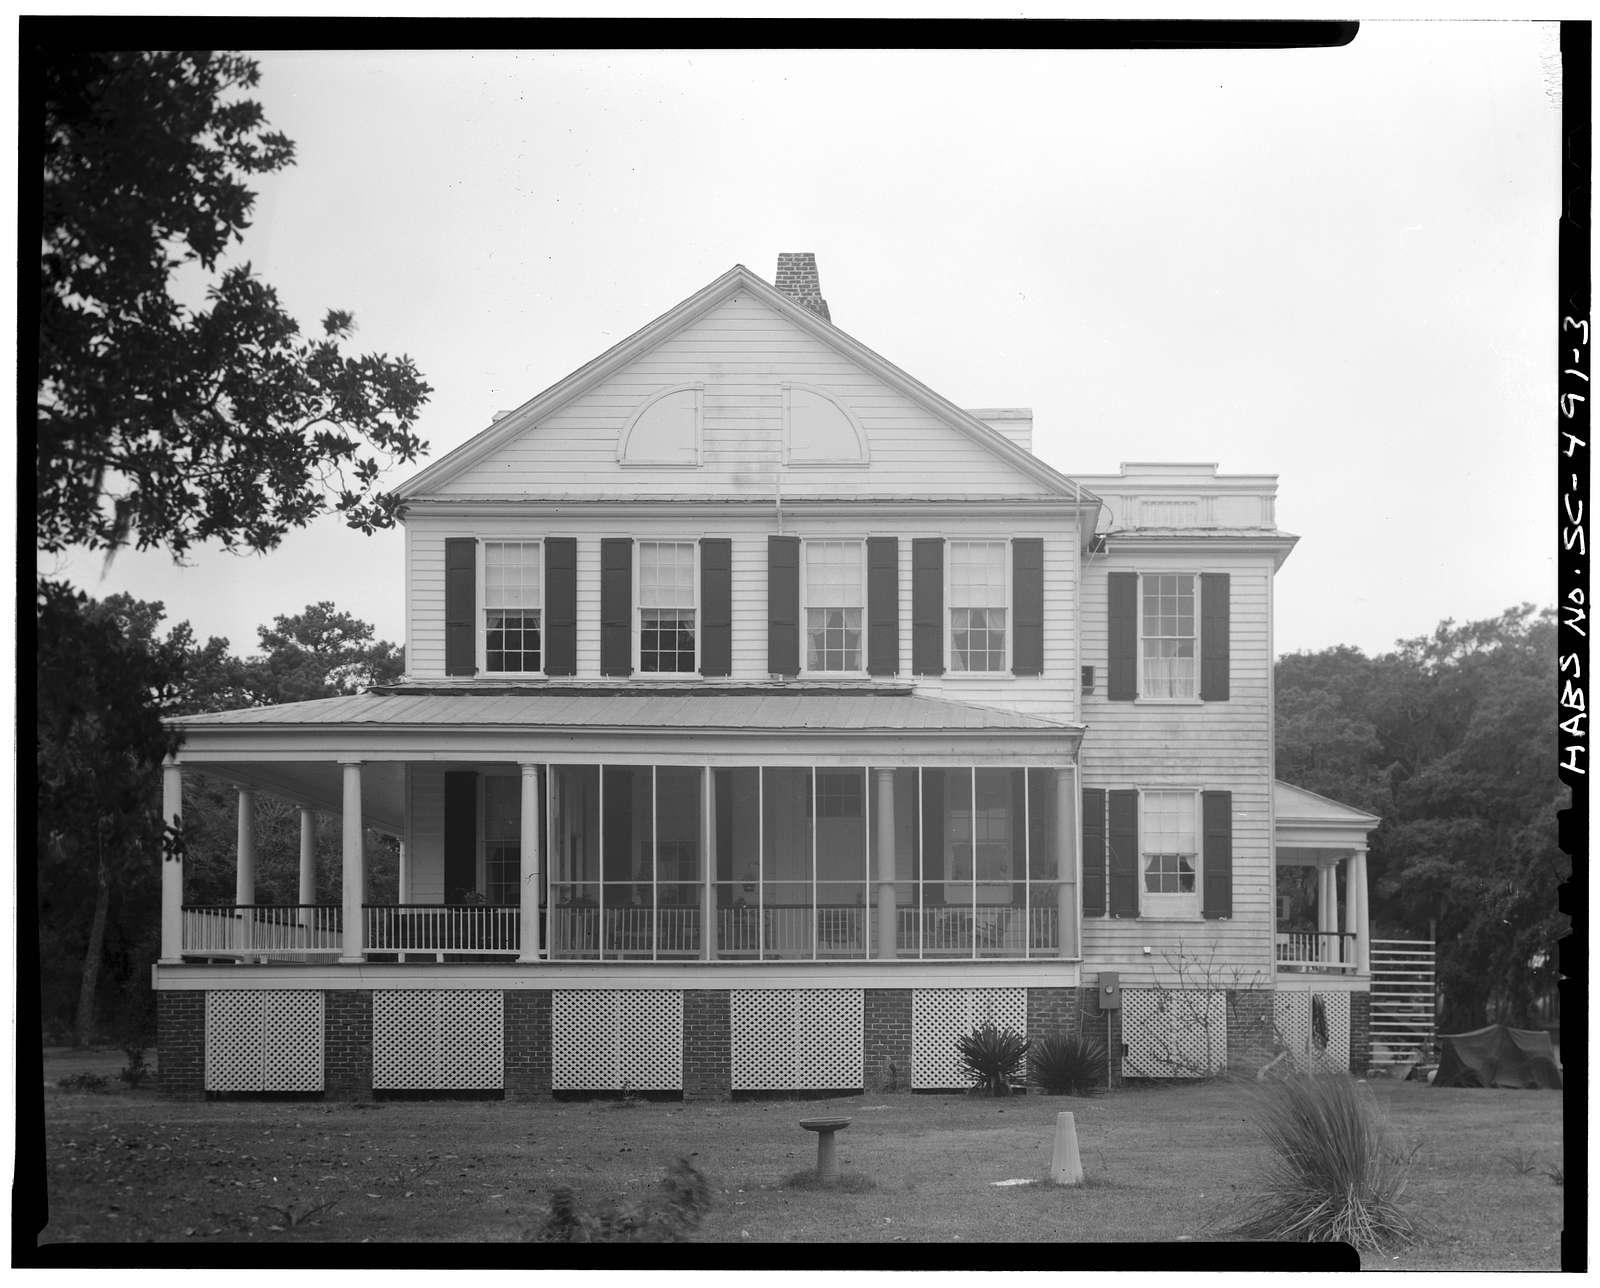 Oak Island (House), County Road 768 vicinity, Edisto Island, Charleston County, SC